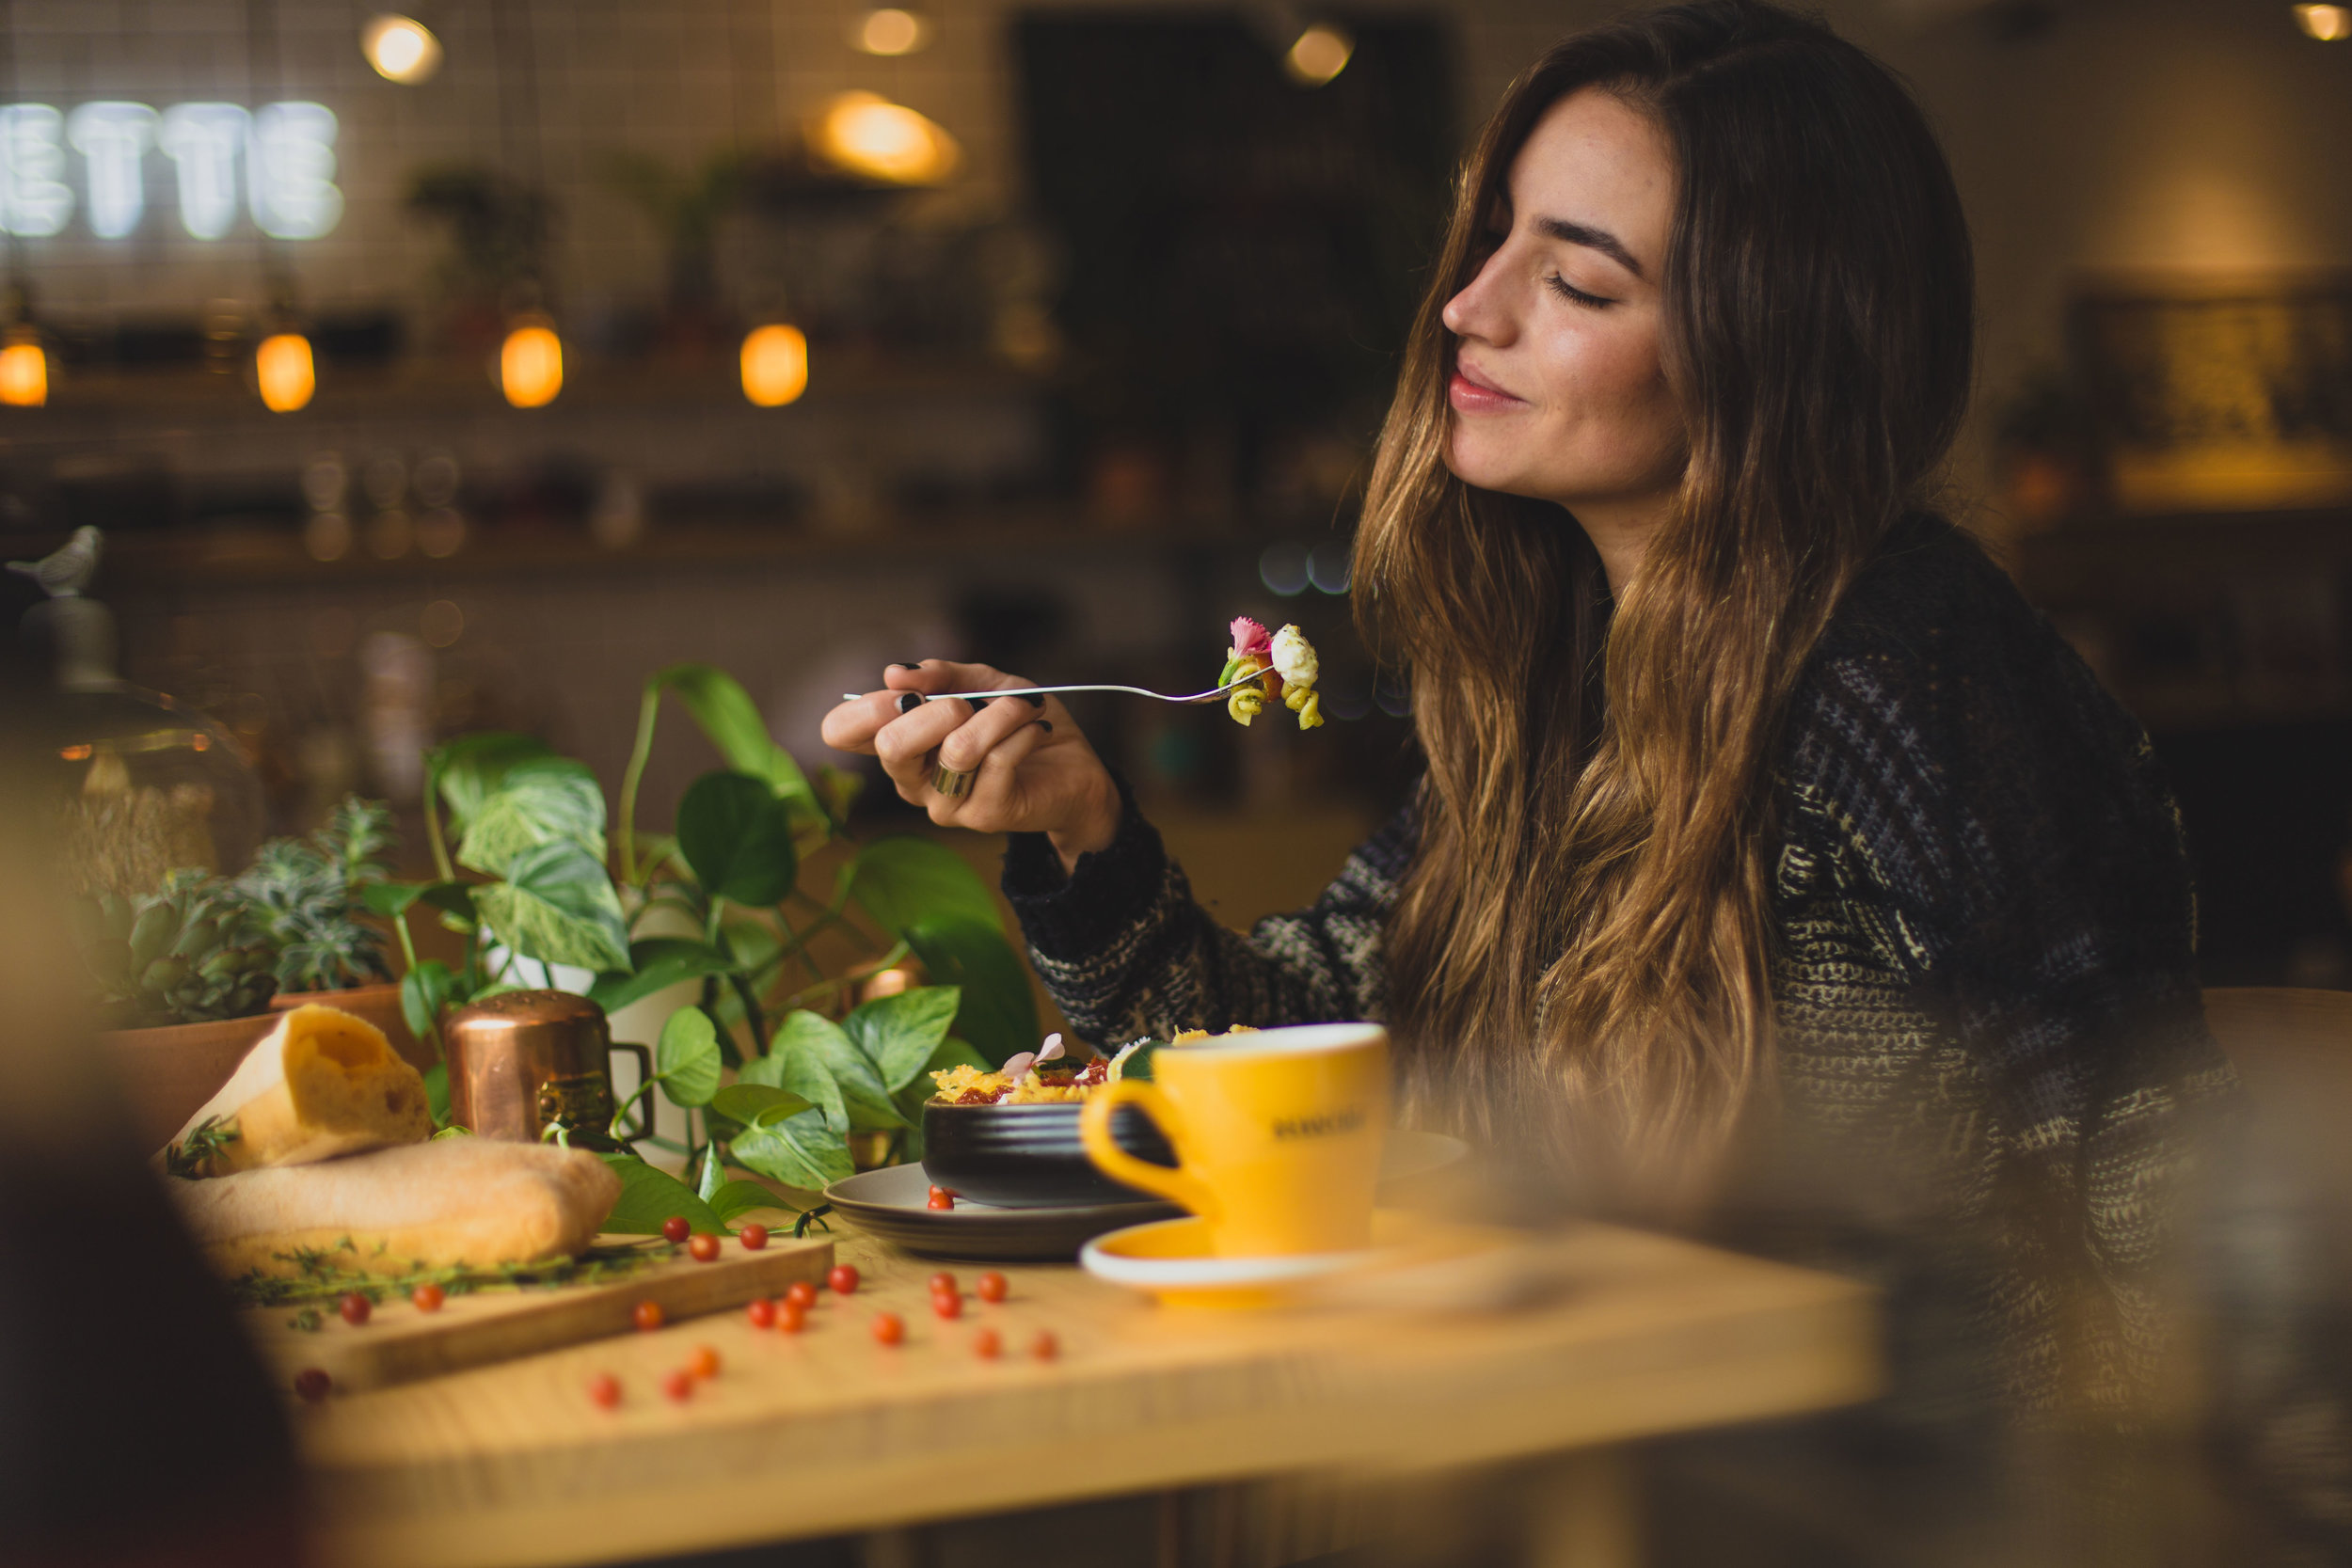 Sensual Eating - Download and save